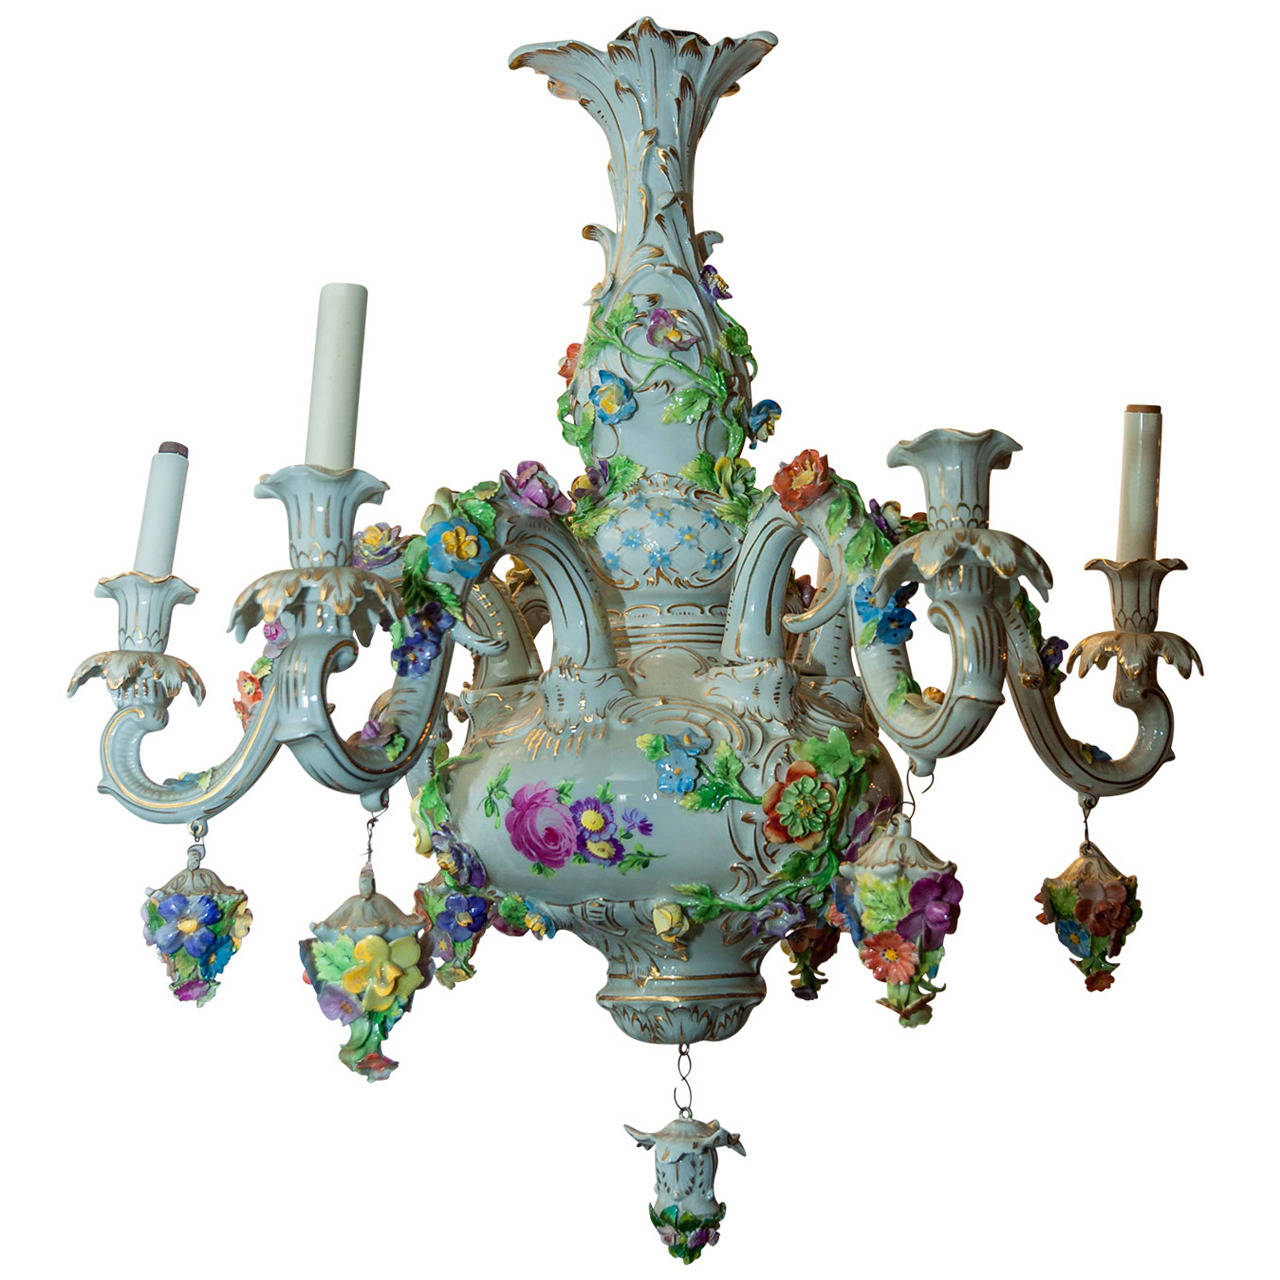 Dresden porcelain floral design six light figural cherub chandelier dresden porcelain floral design six light figural cherub chandelier arubaitofo Gallery